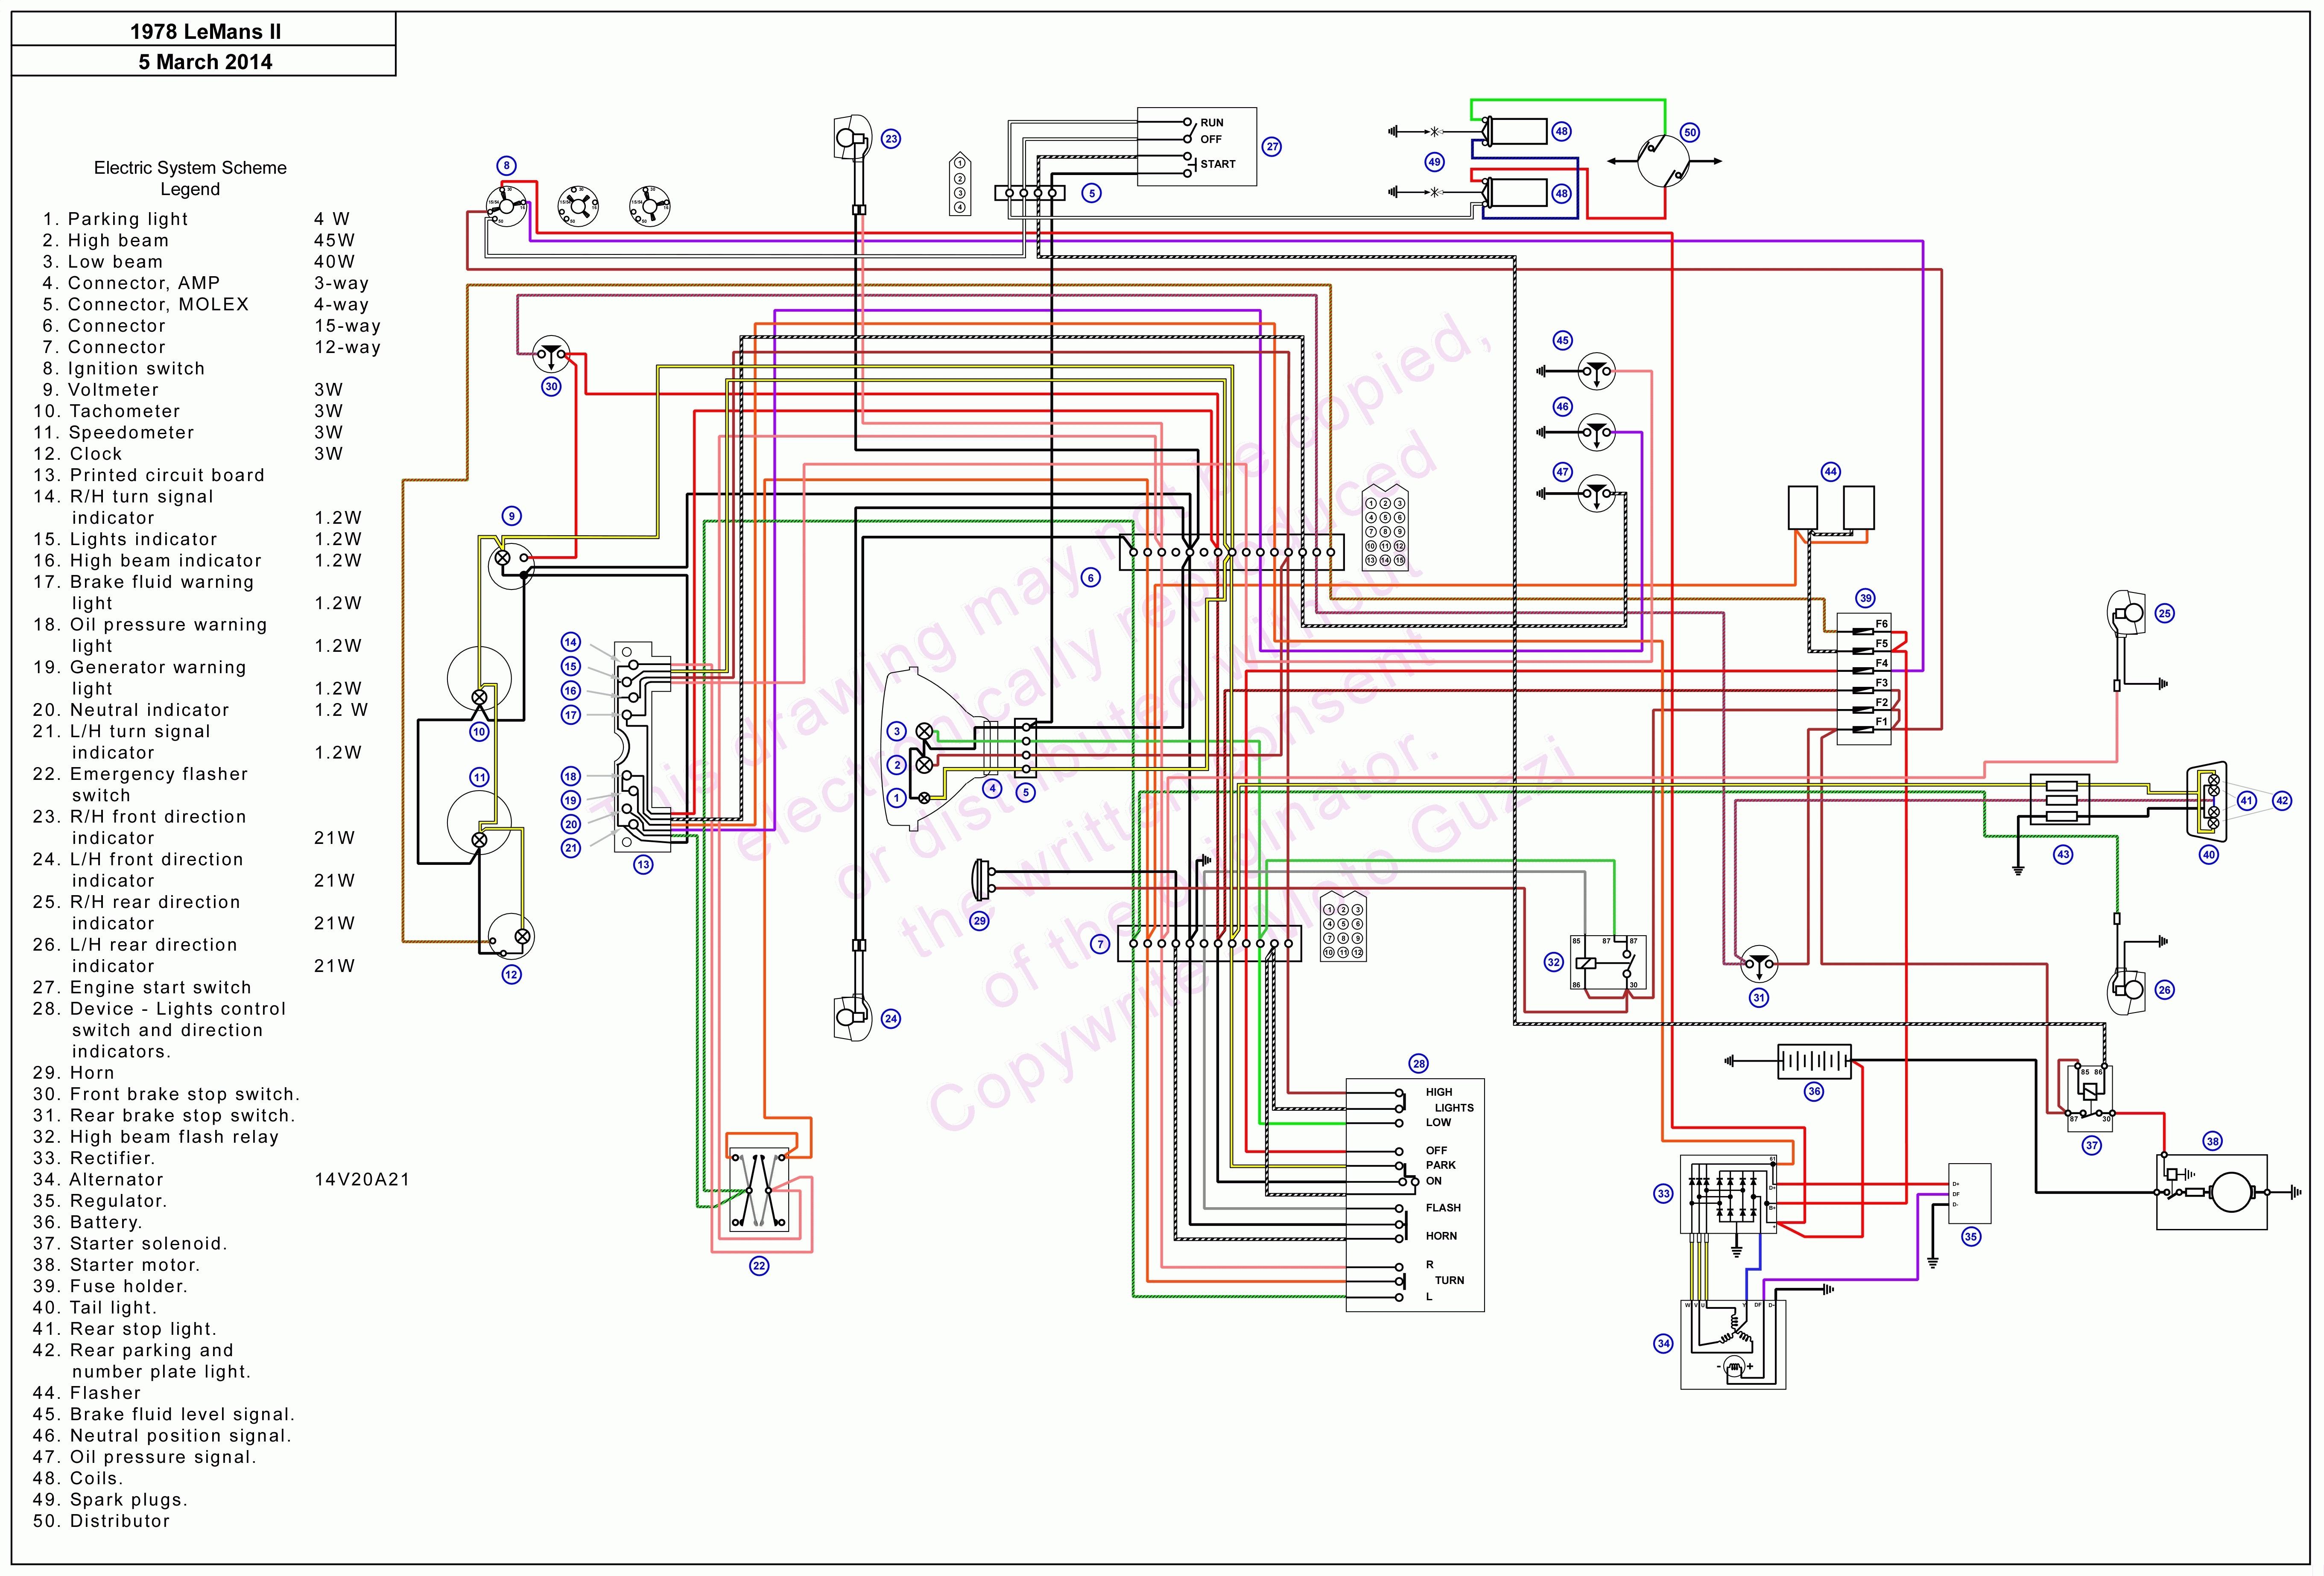 1937 Ford Wiring Diagram 6 Volt Positive Ground Wiring Diagram